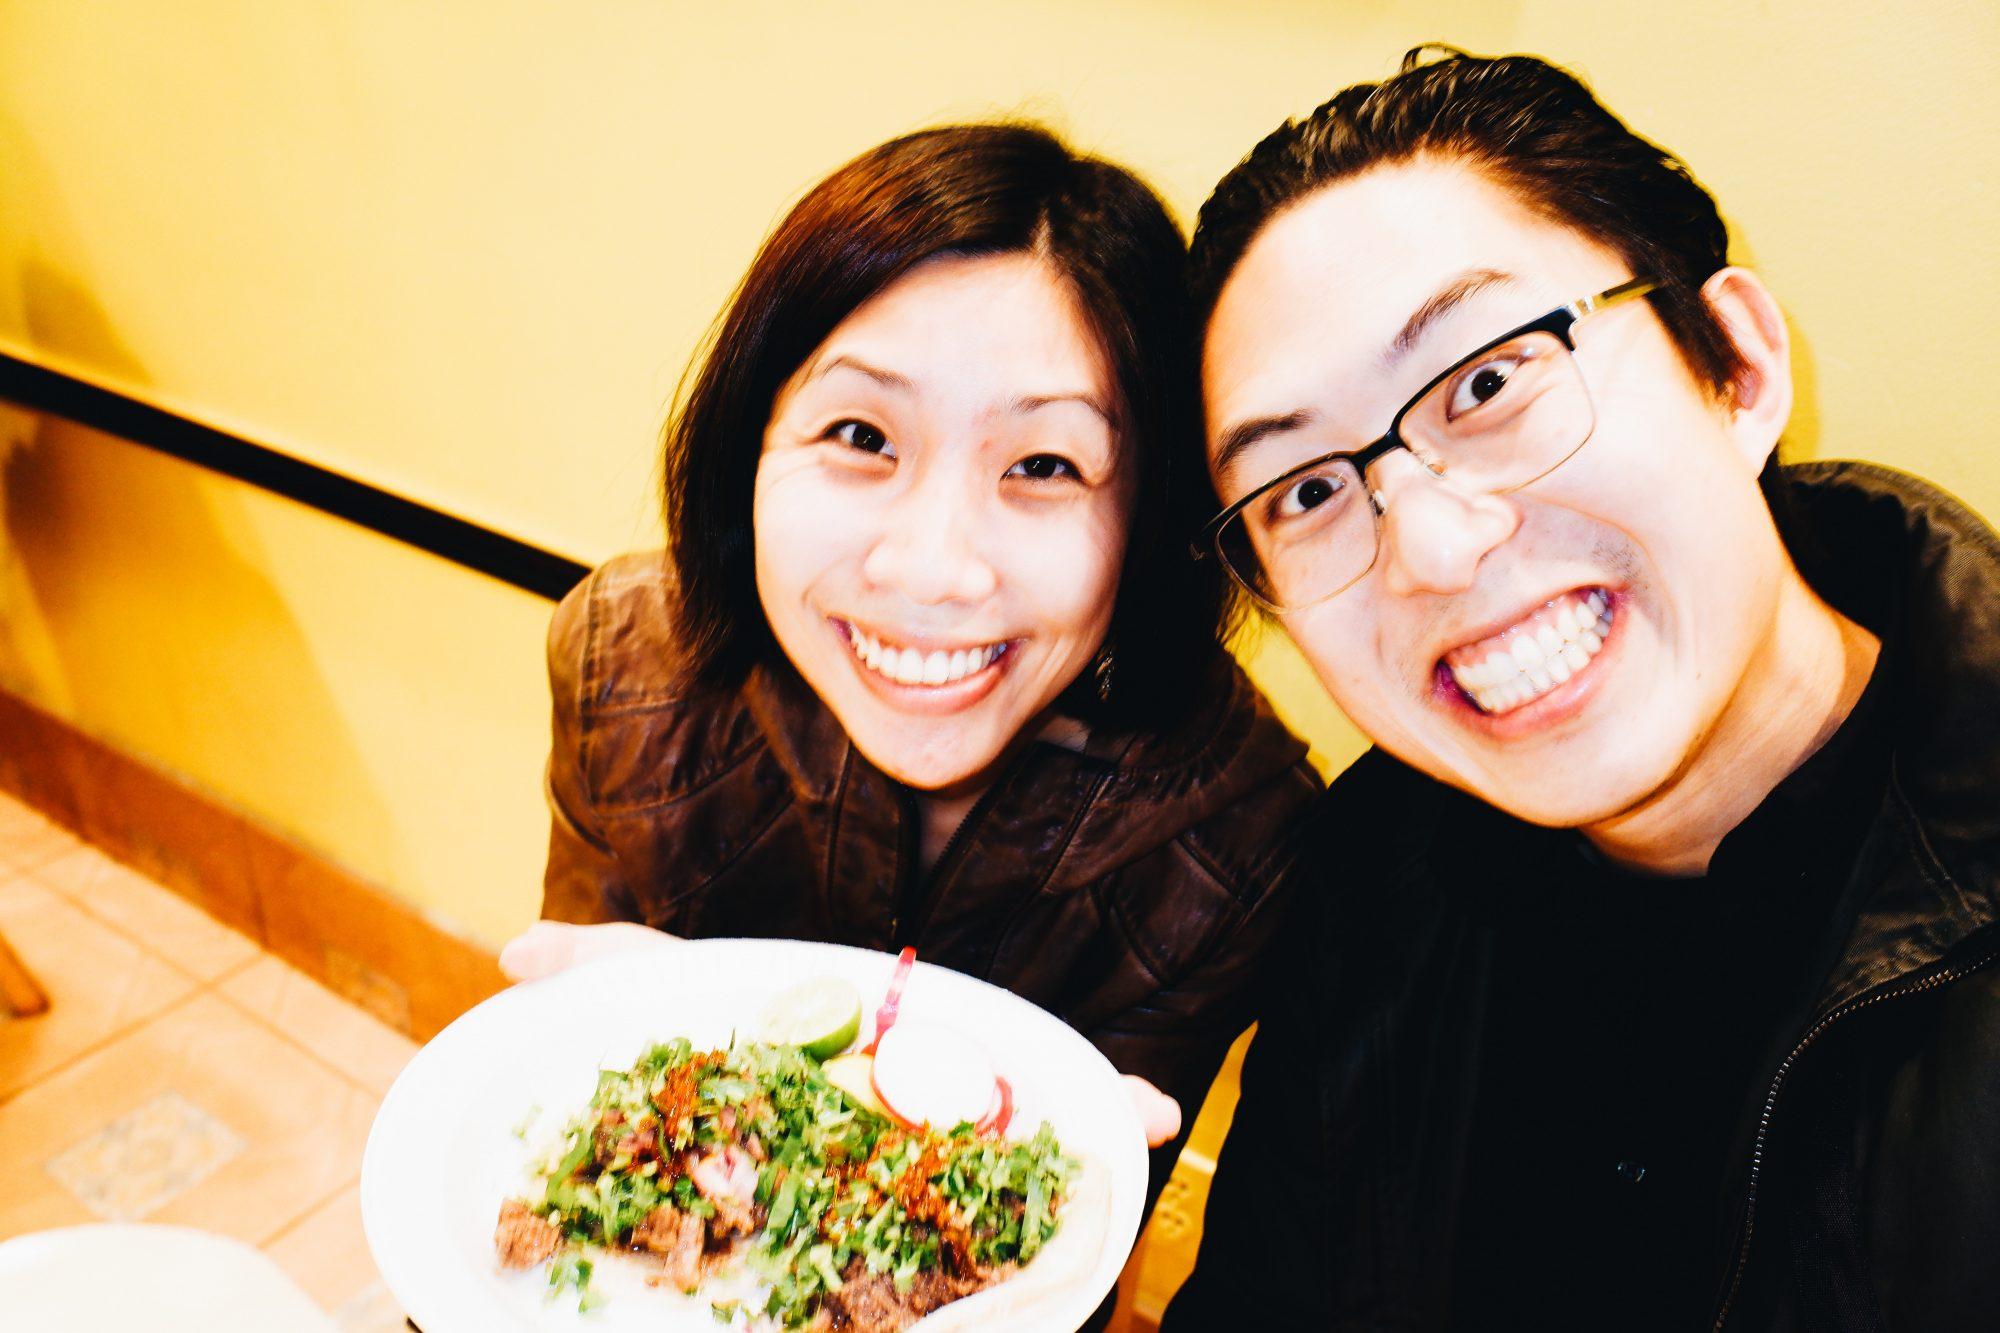 Eric Kim and Cindy selfie